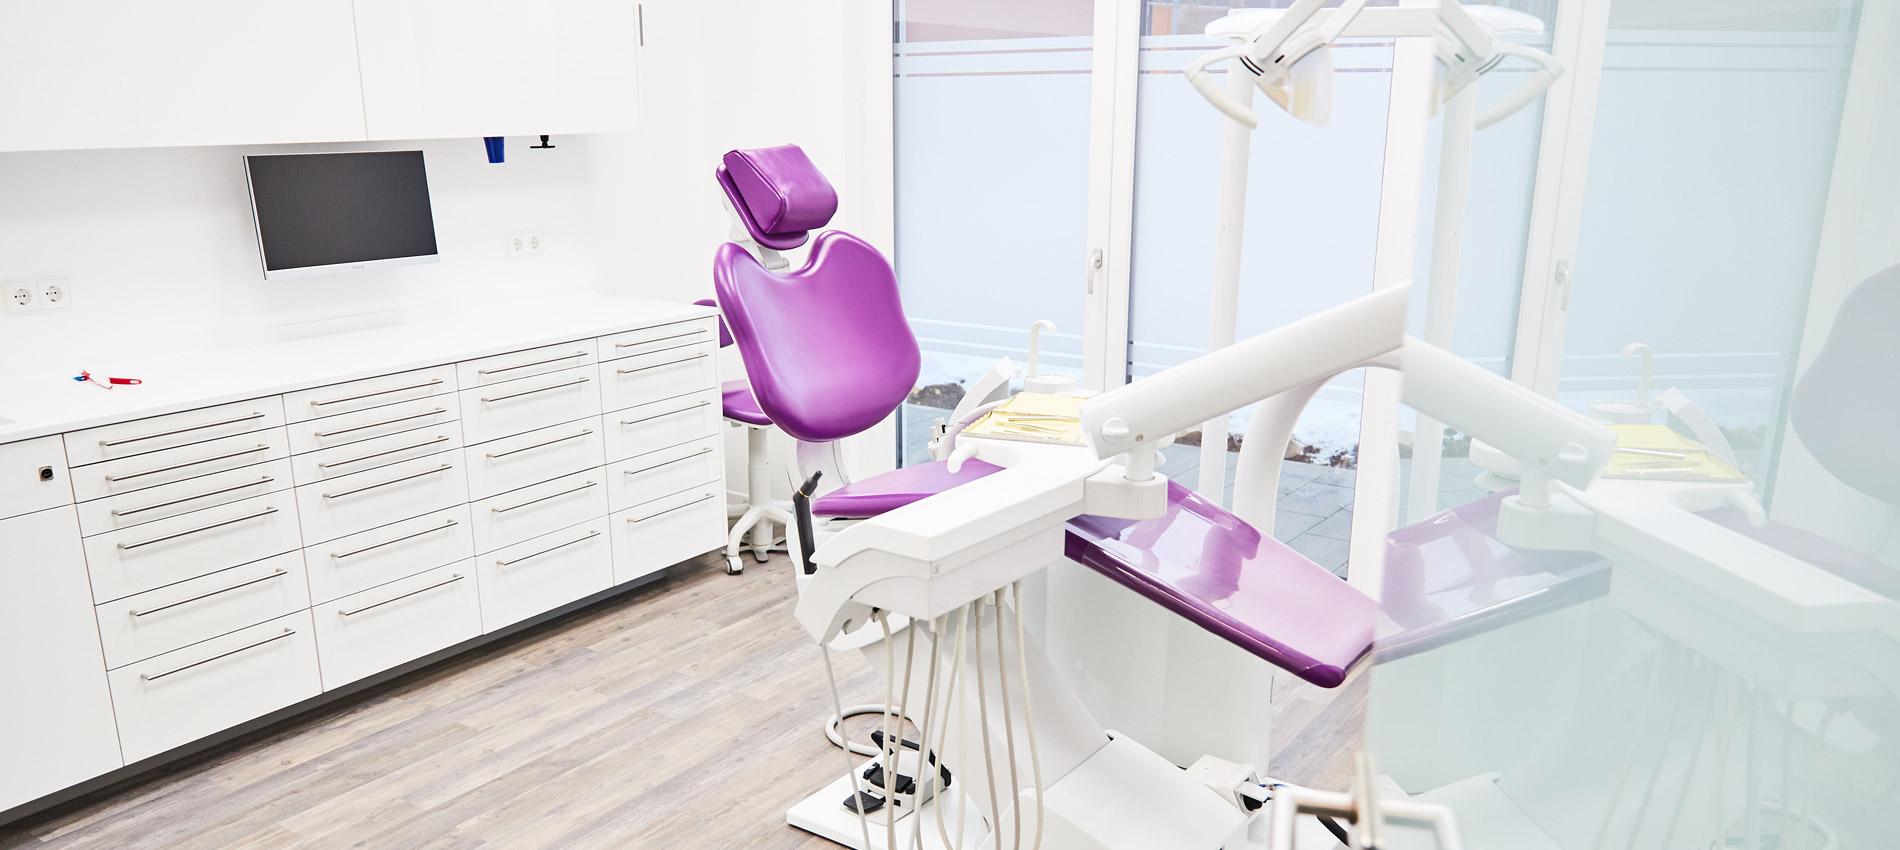 Zahnarztpraxis Ingo Lange - Herausnehmbarer Zahnersatz 1